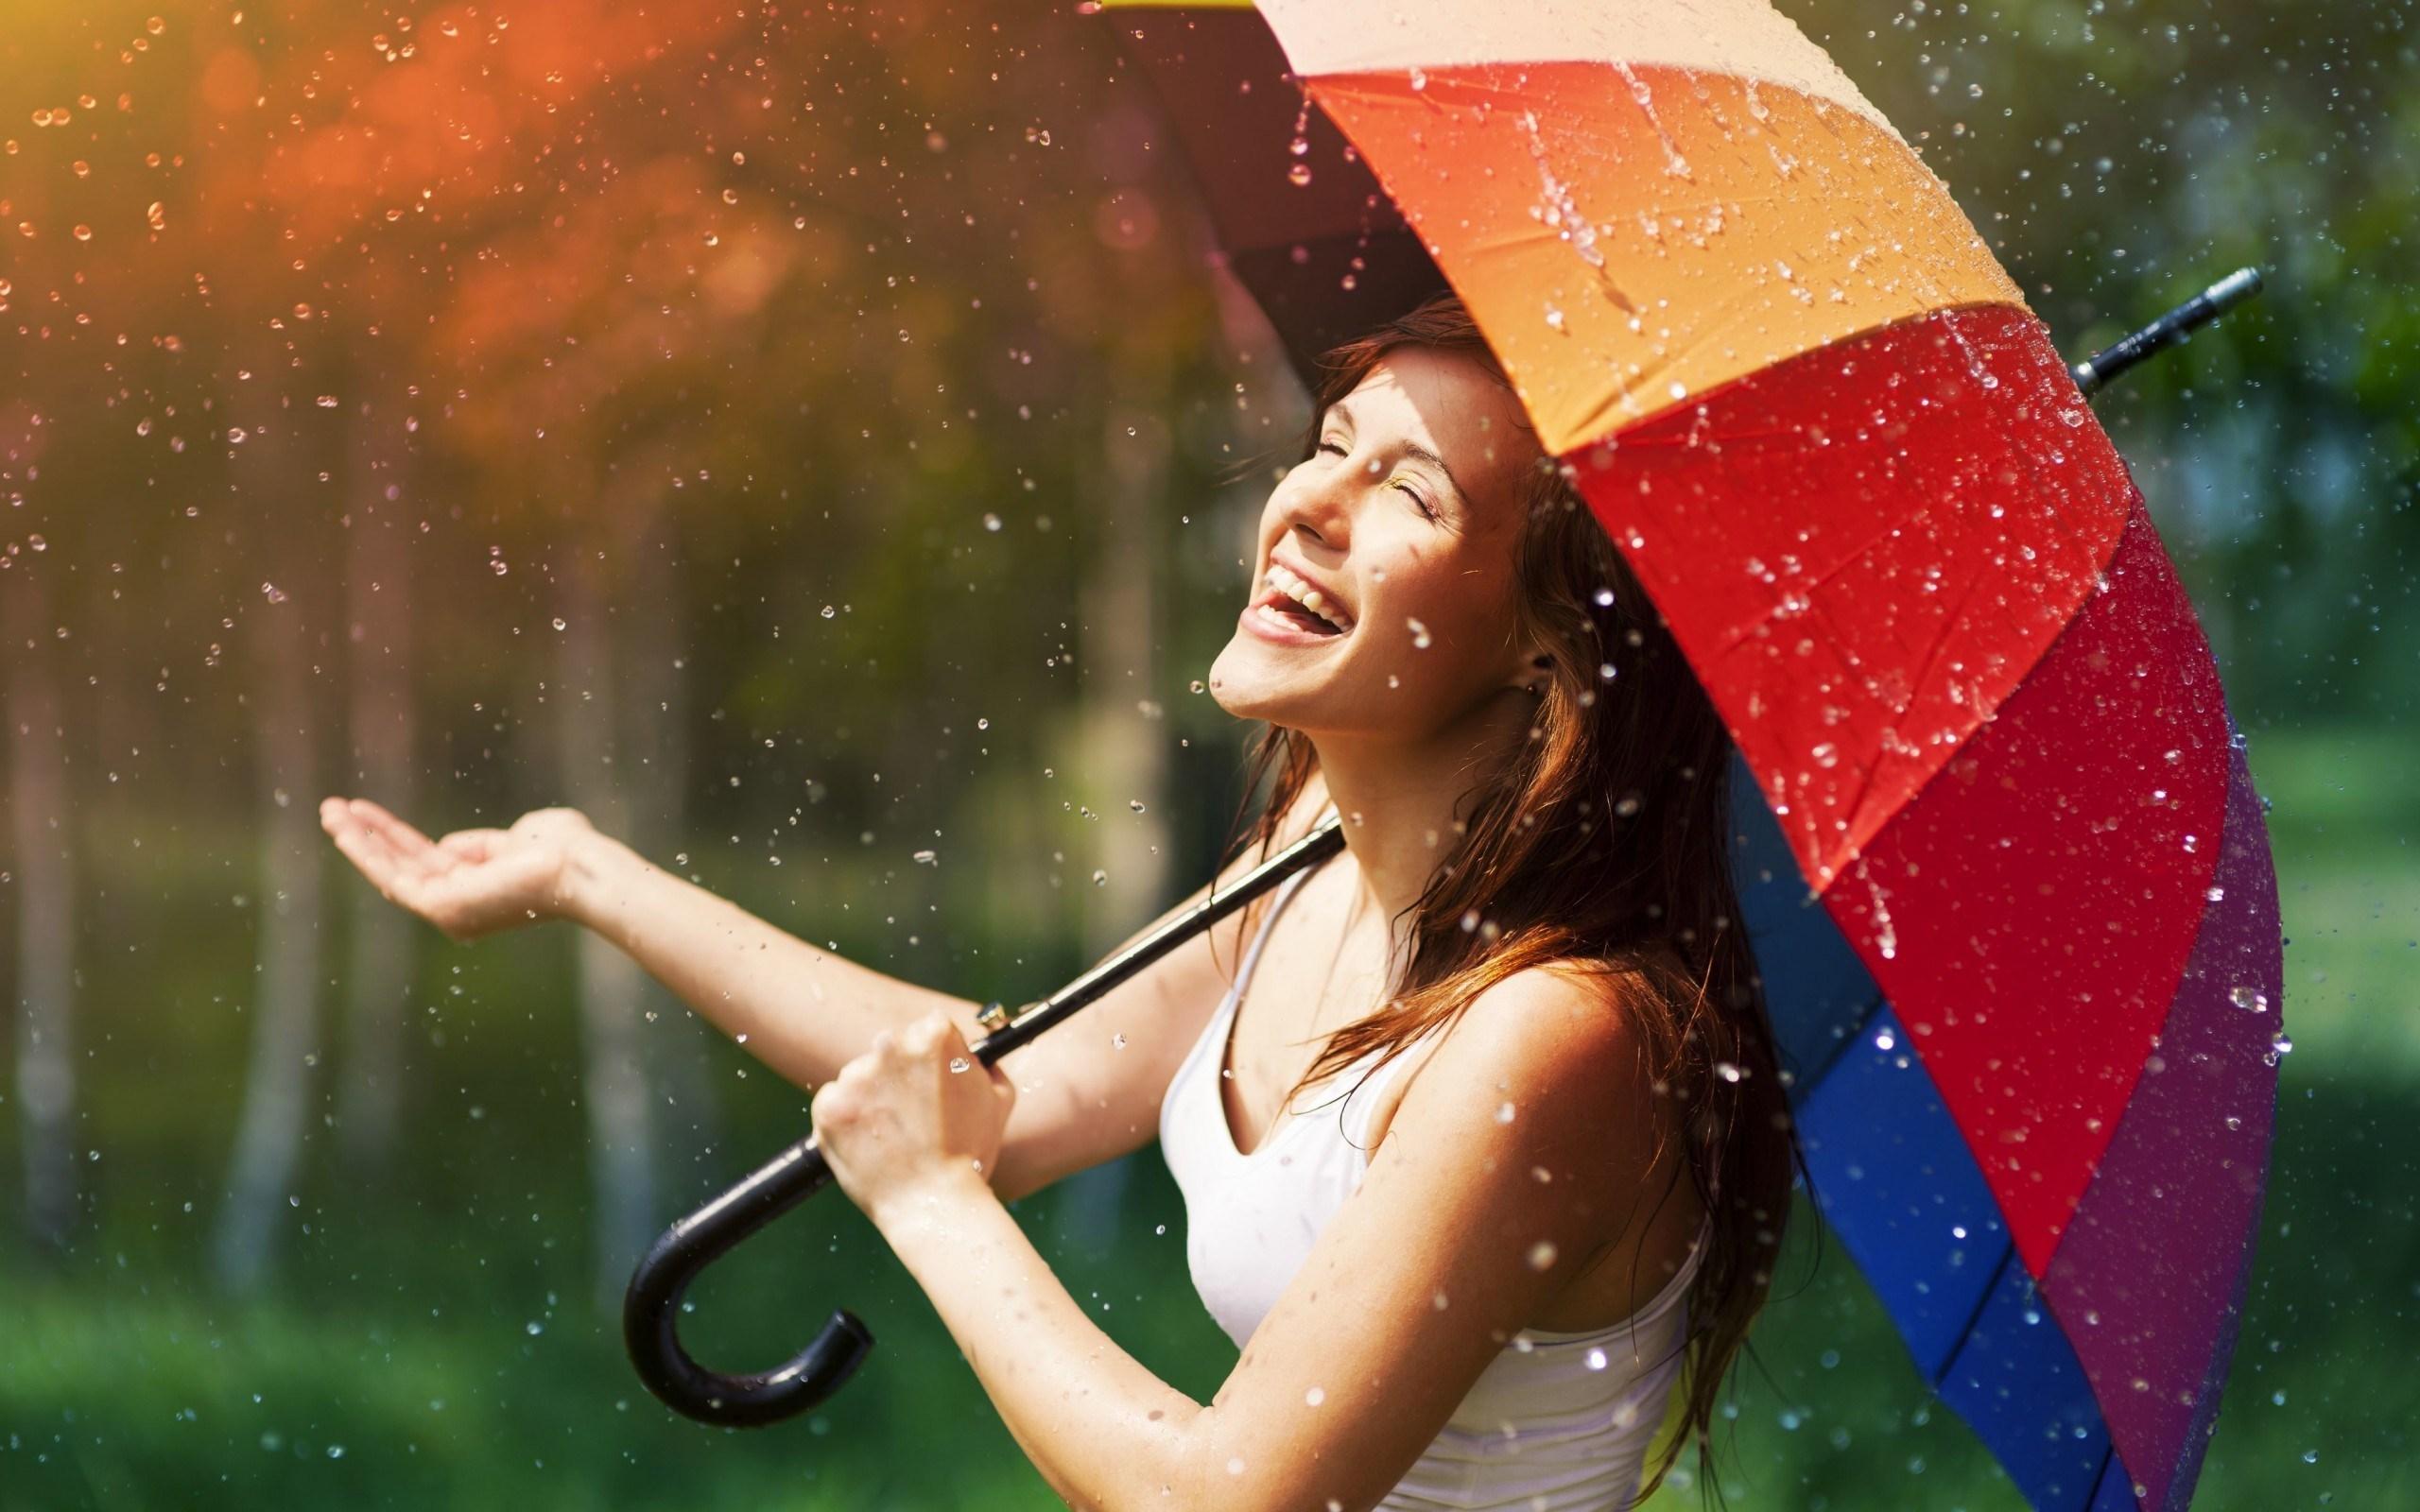 mood-girl-brunette-smile-happy-umbrella-rain-wallpaper-2560x1600